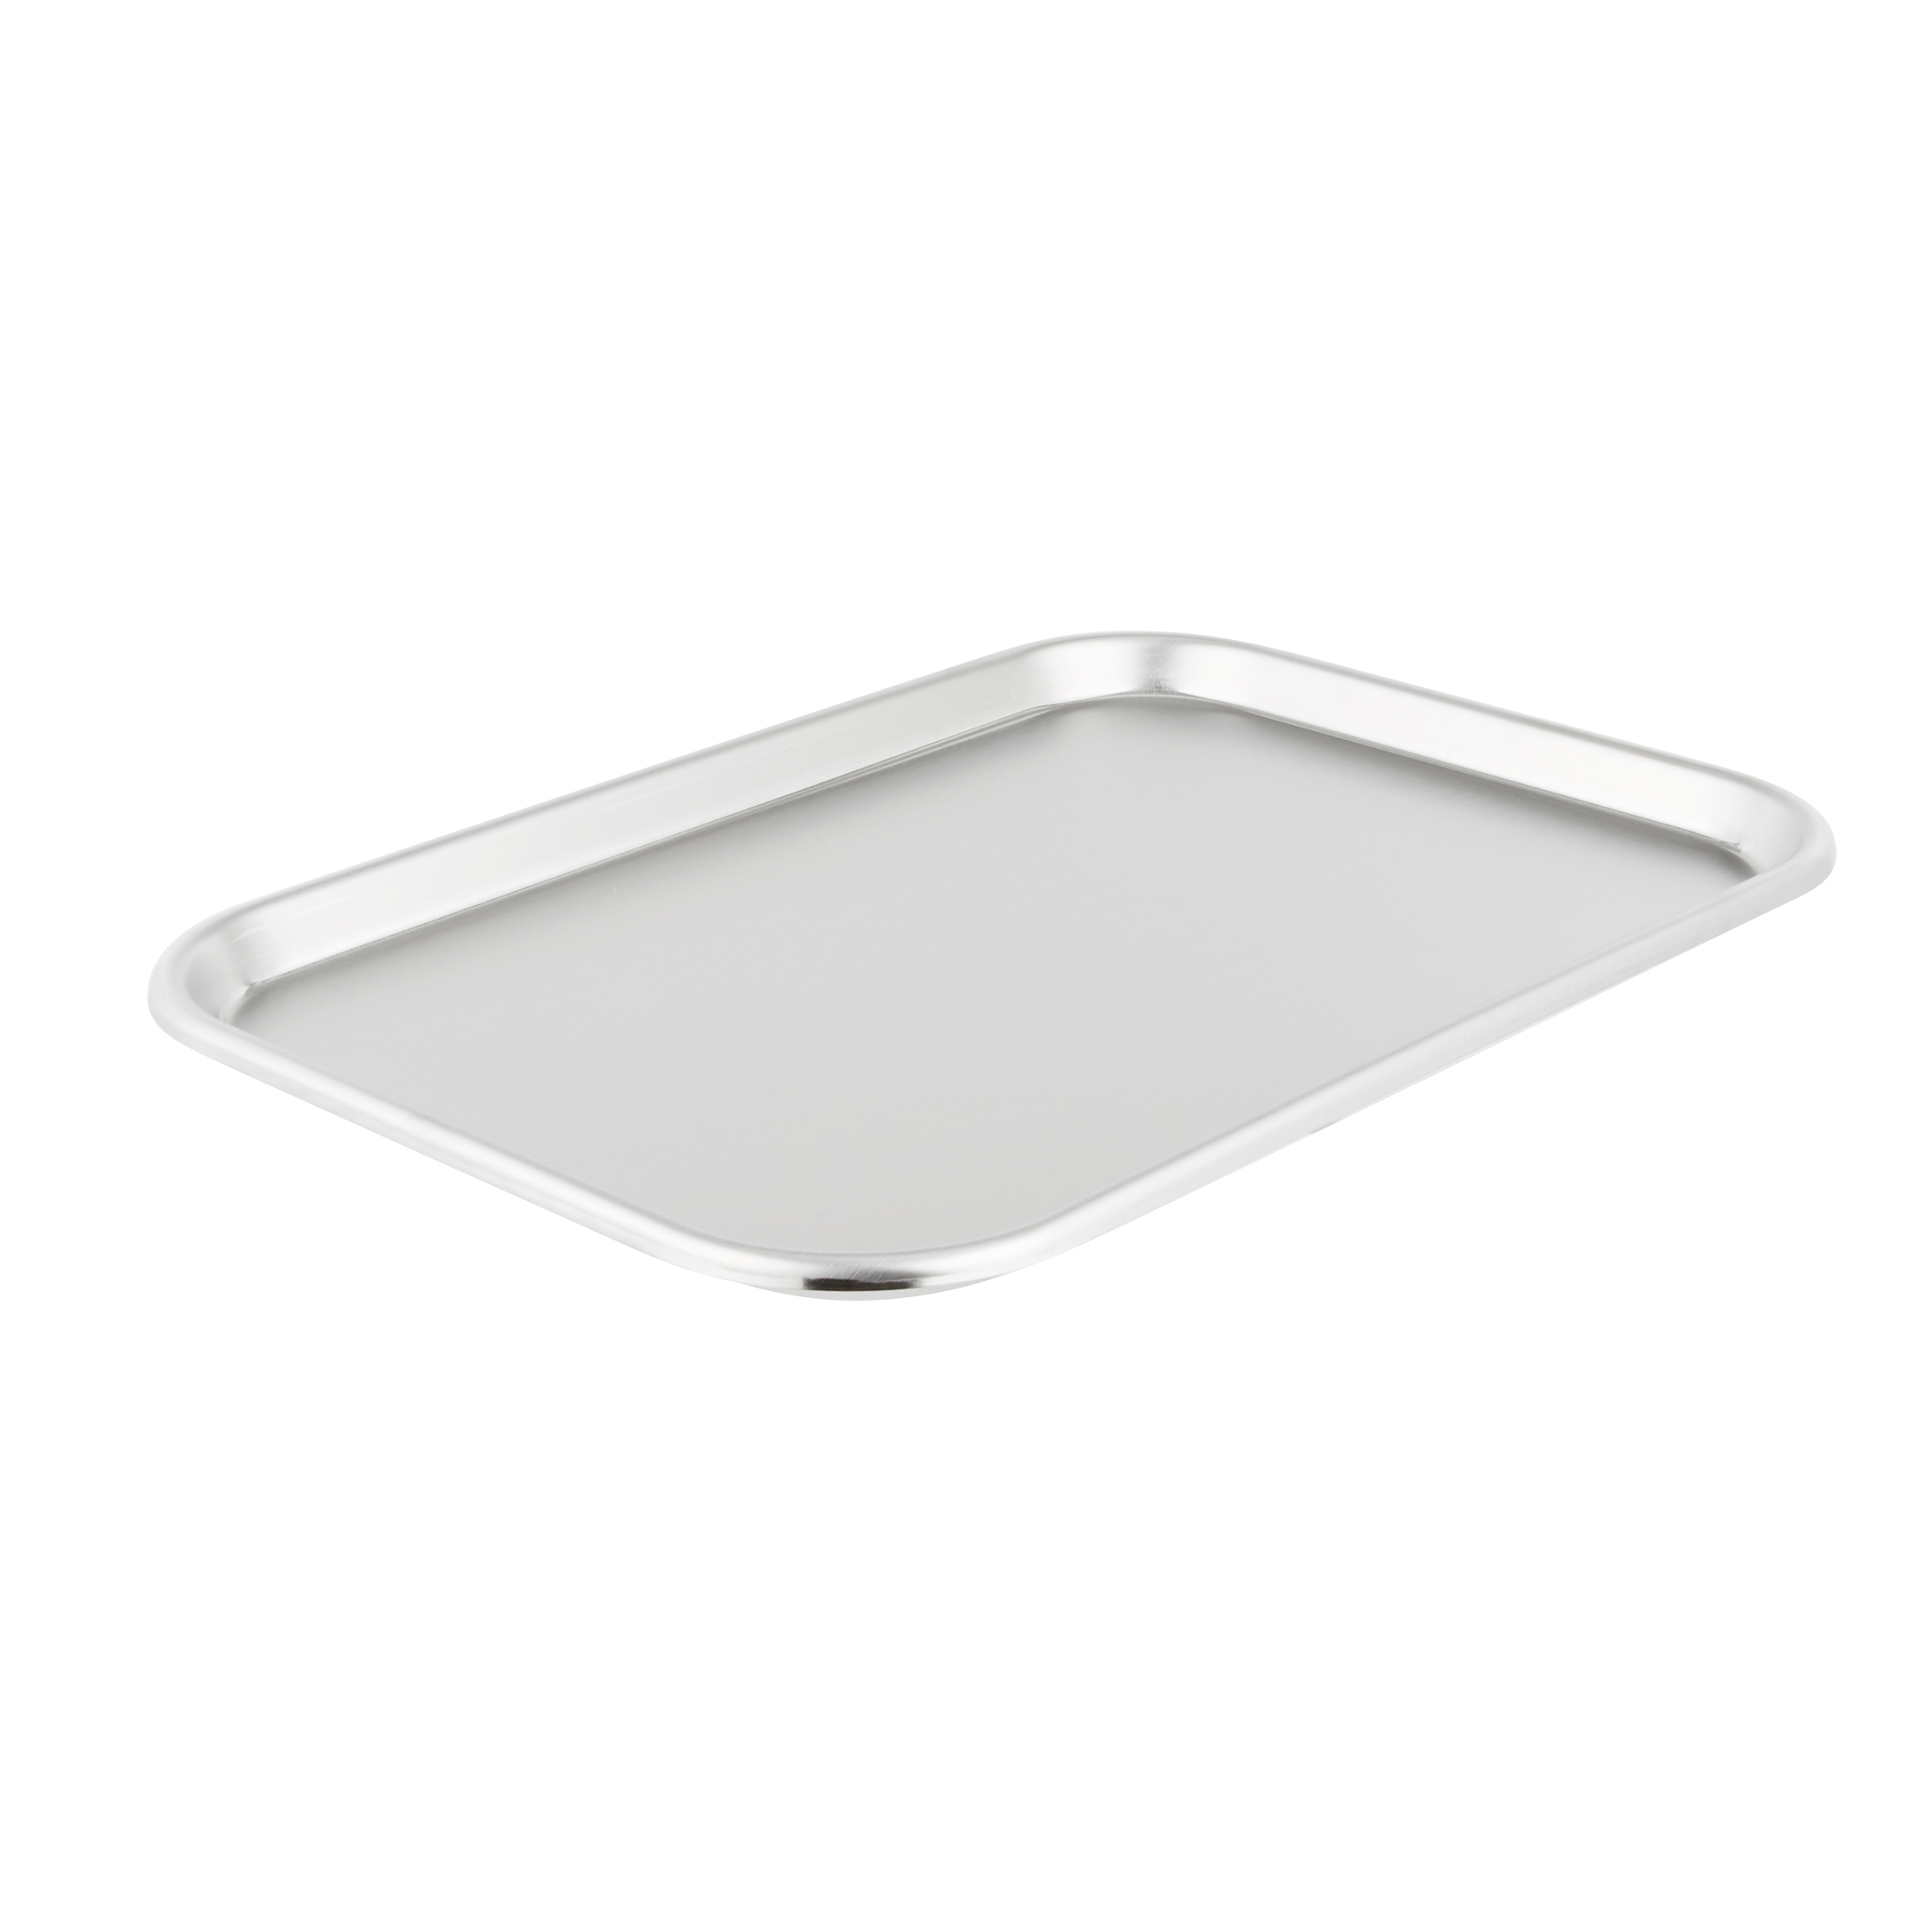 Vollrath 80150 serving & display tray, metal